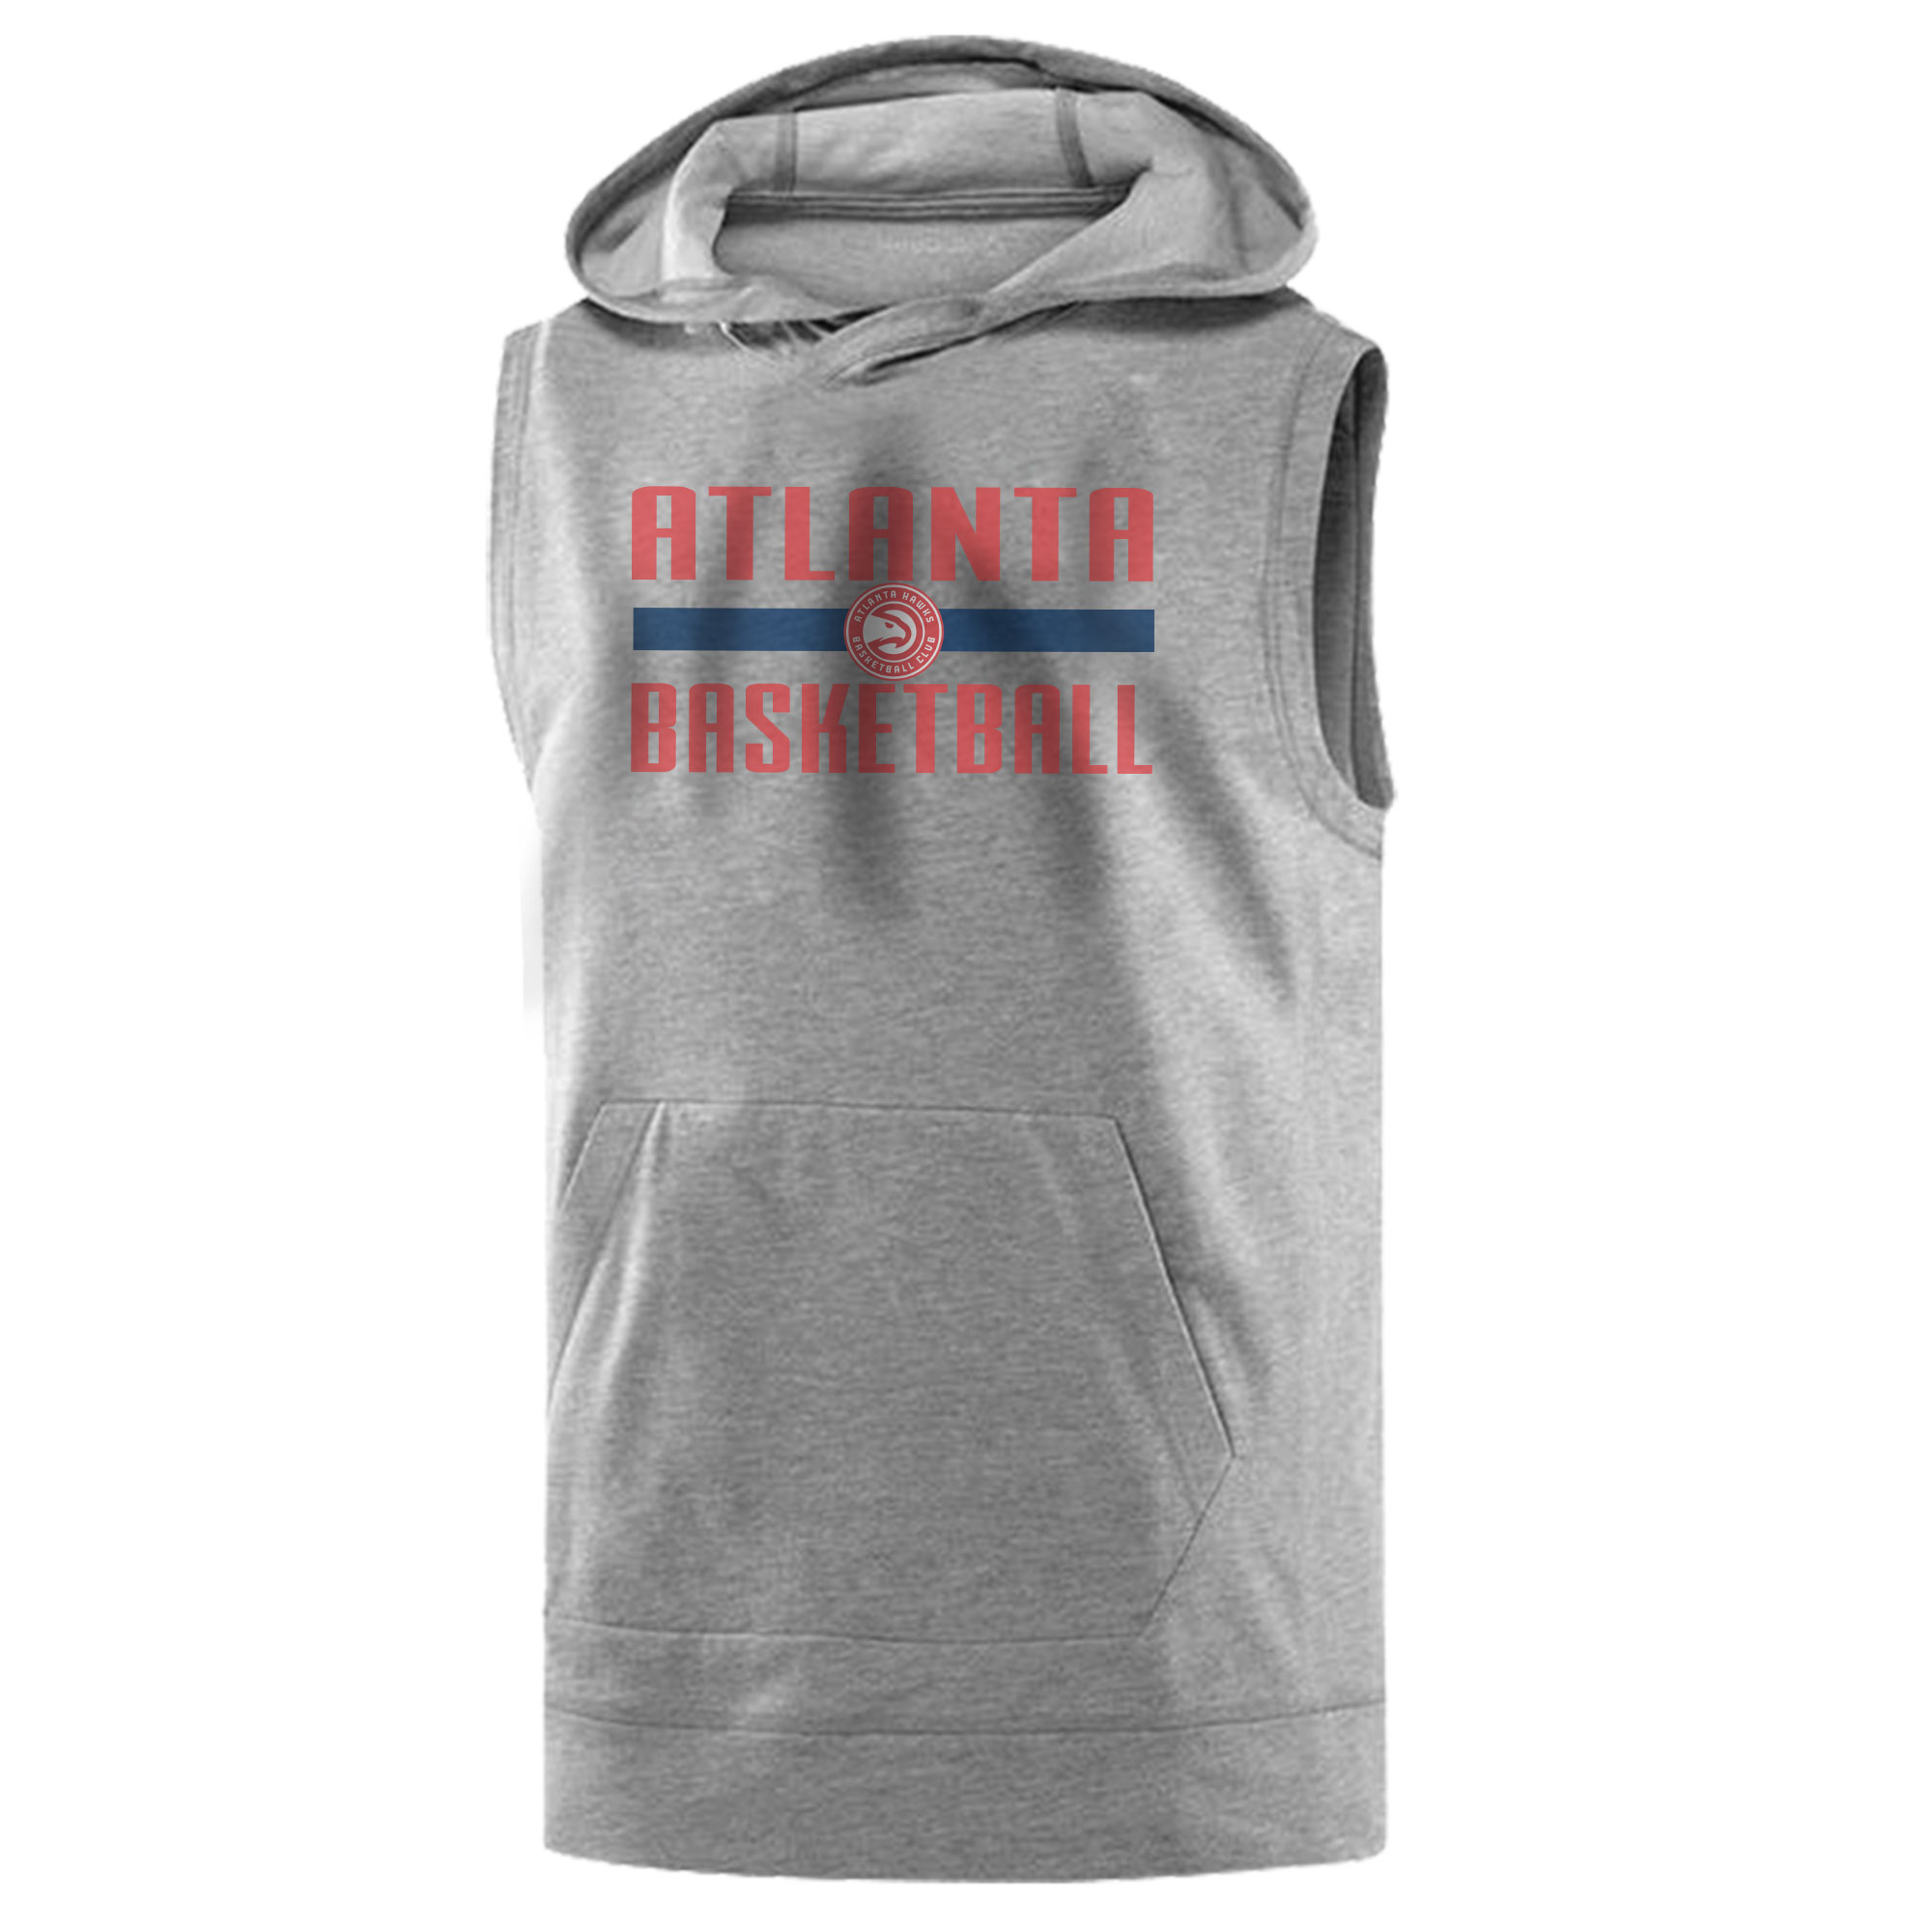 Atlanta Basketball Sleeveless (KLS-GRY-NP-atl.bsktbll-650)